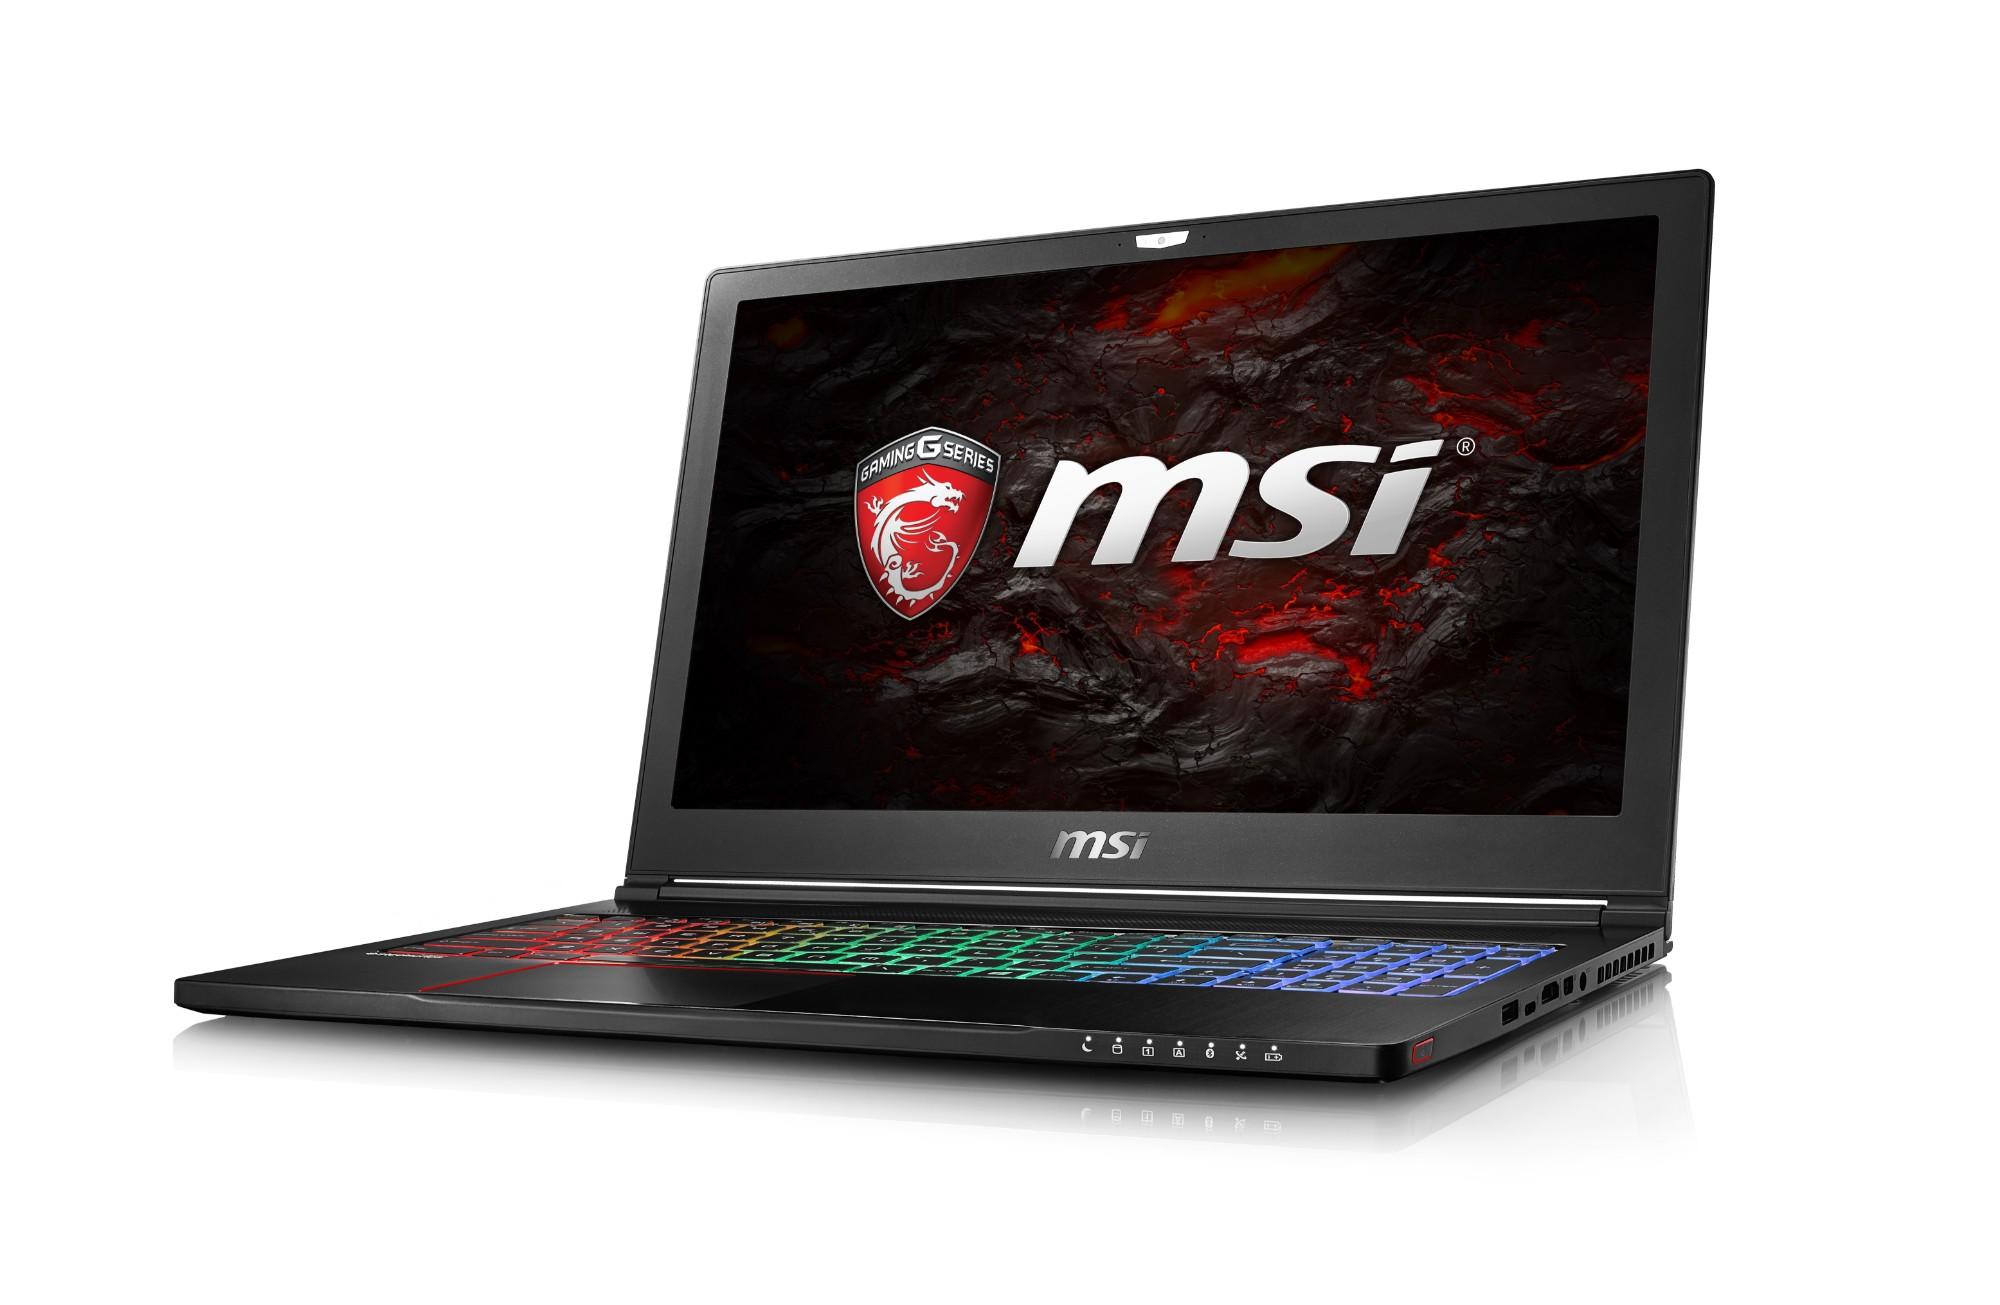 Gs63 7rd 091uk Stealth Pro - 15.6in - i7 7700hq - 8GB Ram - 128GB SSD - 1TB HDD - Win10 Home - Black - Qwerty Uk